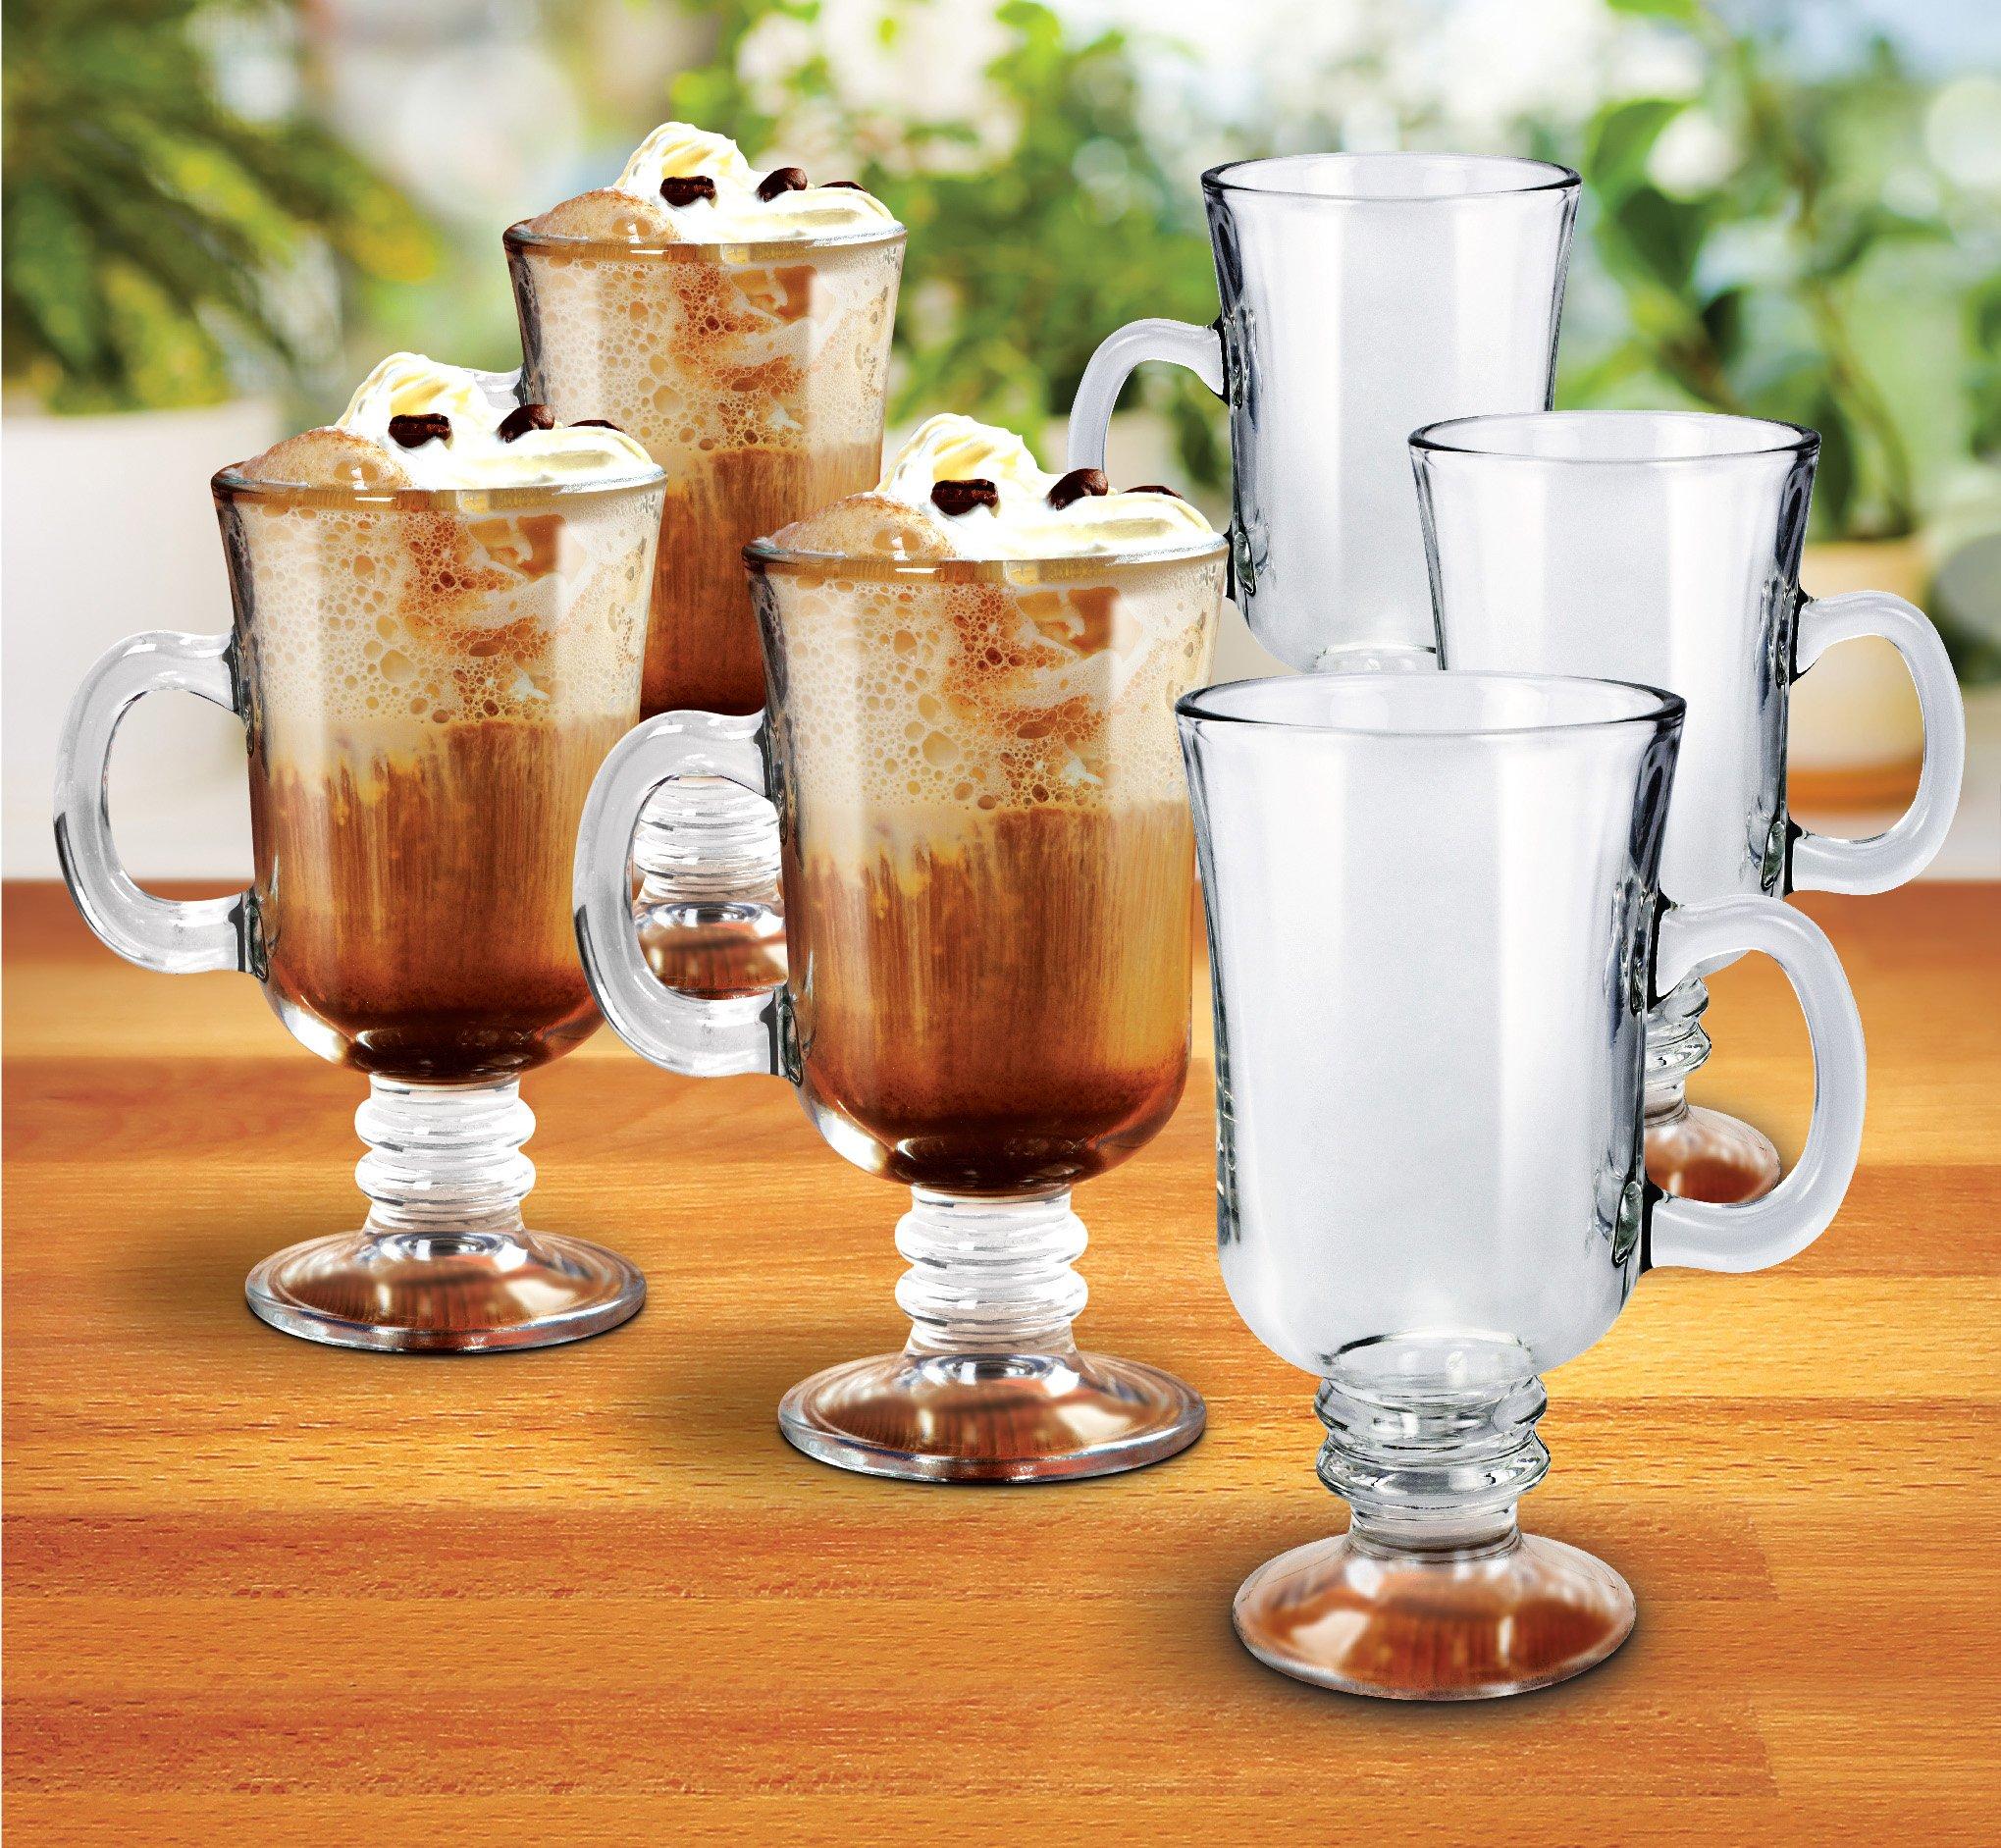 KOVOT Set of 6 Irish Coffee Mugs - Includes (6) 8-Ounce Glasses